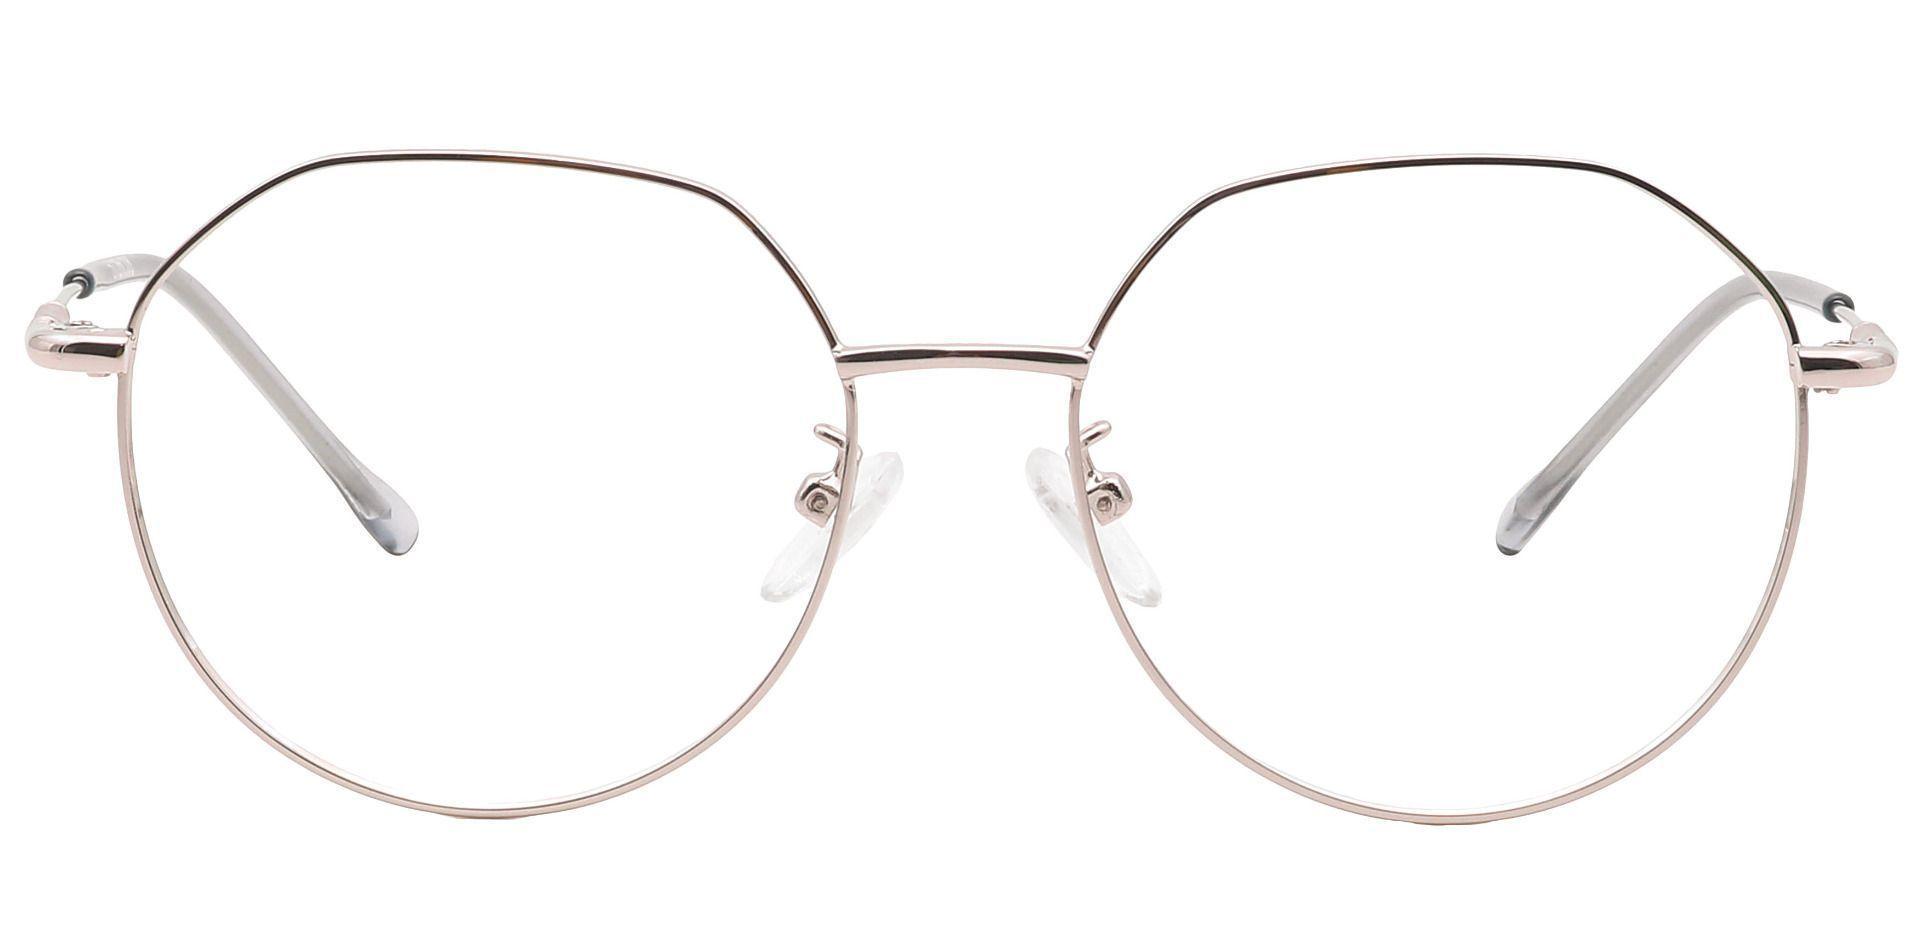 Wesley Round Eyeglasses Frame - Clear